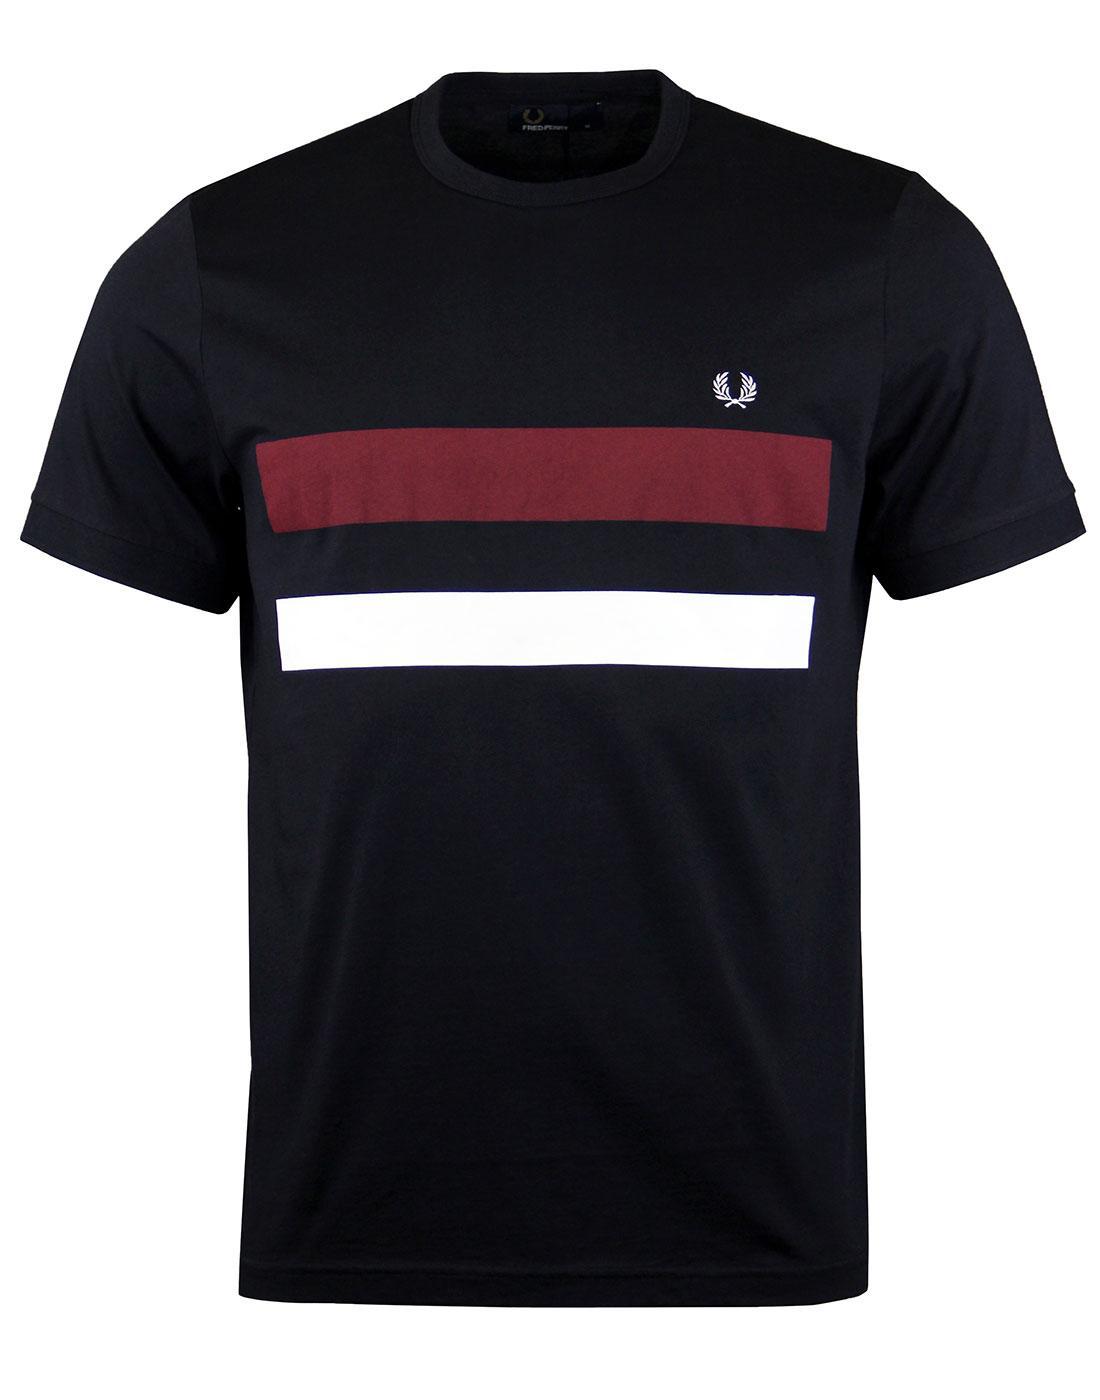 FRED PERRY Mens Retro Bold Stripe Print T-shirt